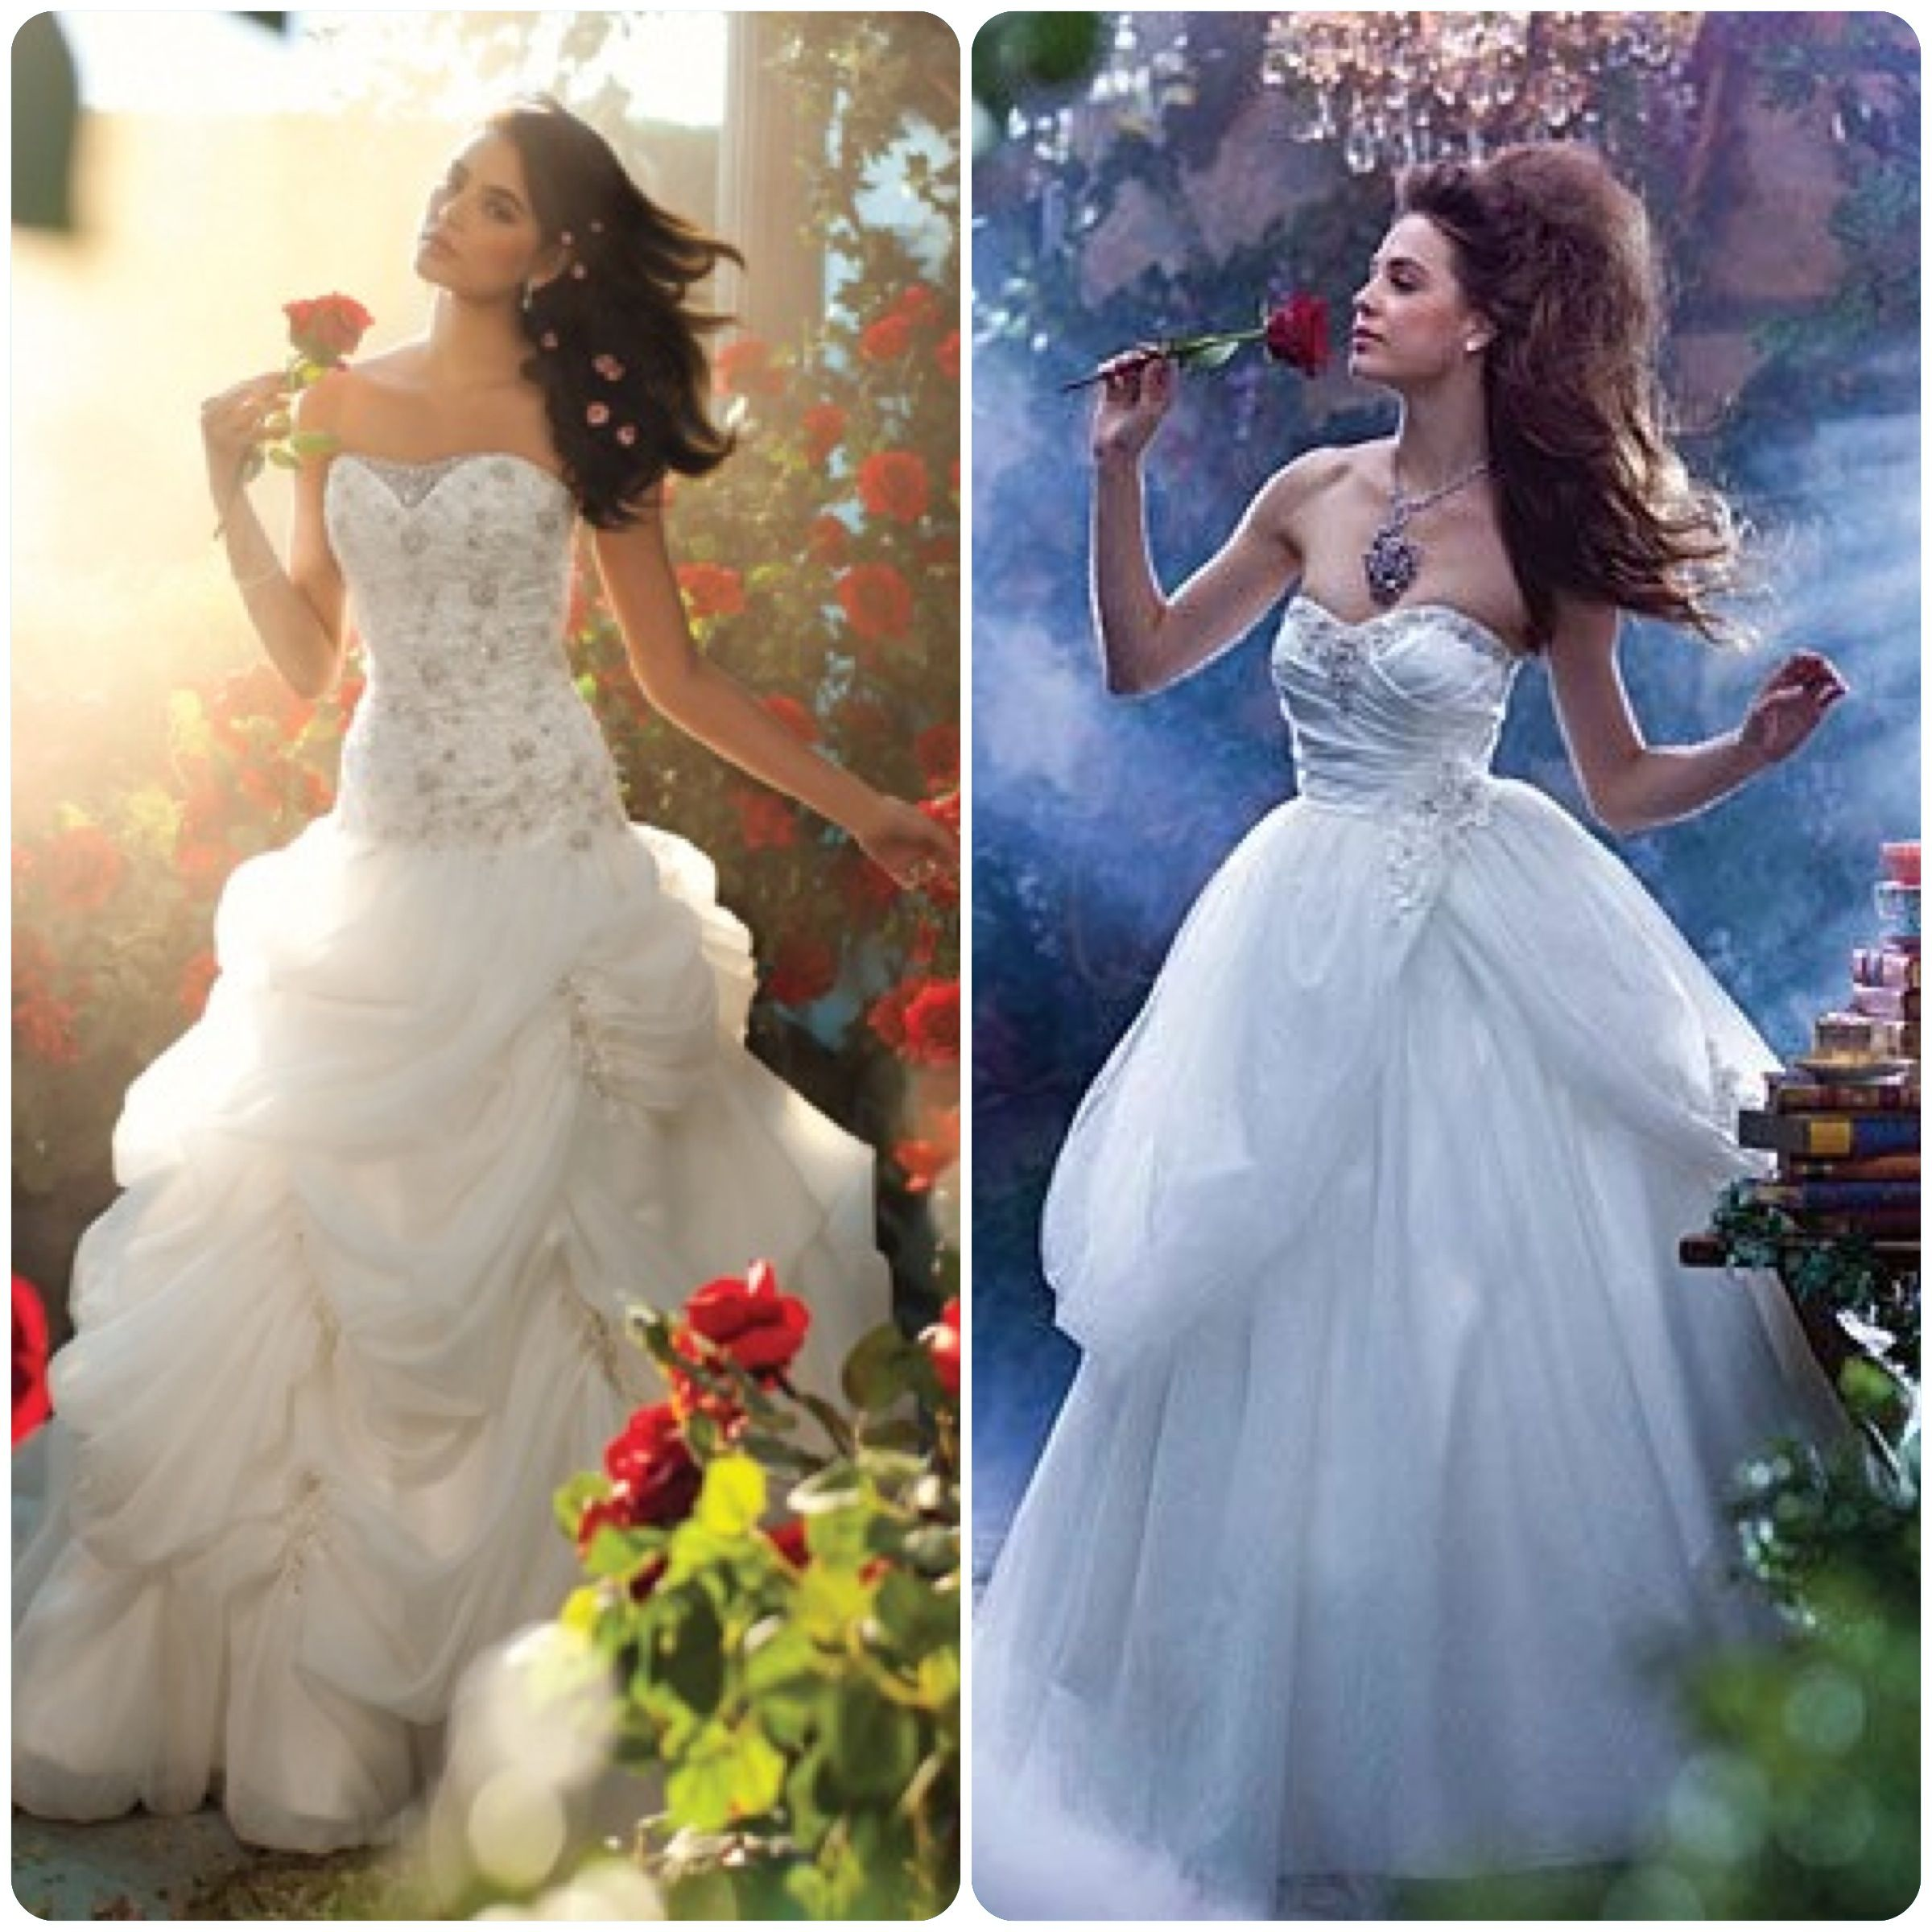 Belle Disney Princesse Princess Mariage Wedding Robe Dress Alfred AngeloWedding